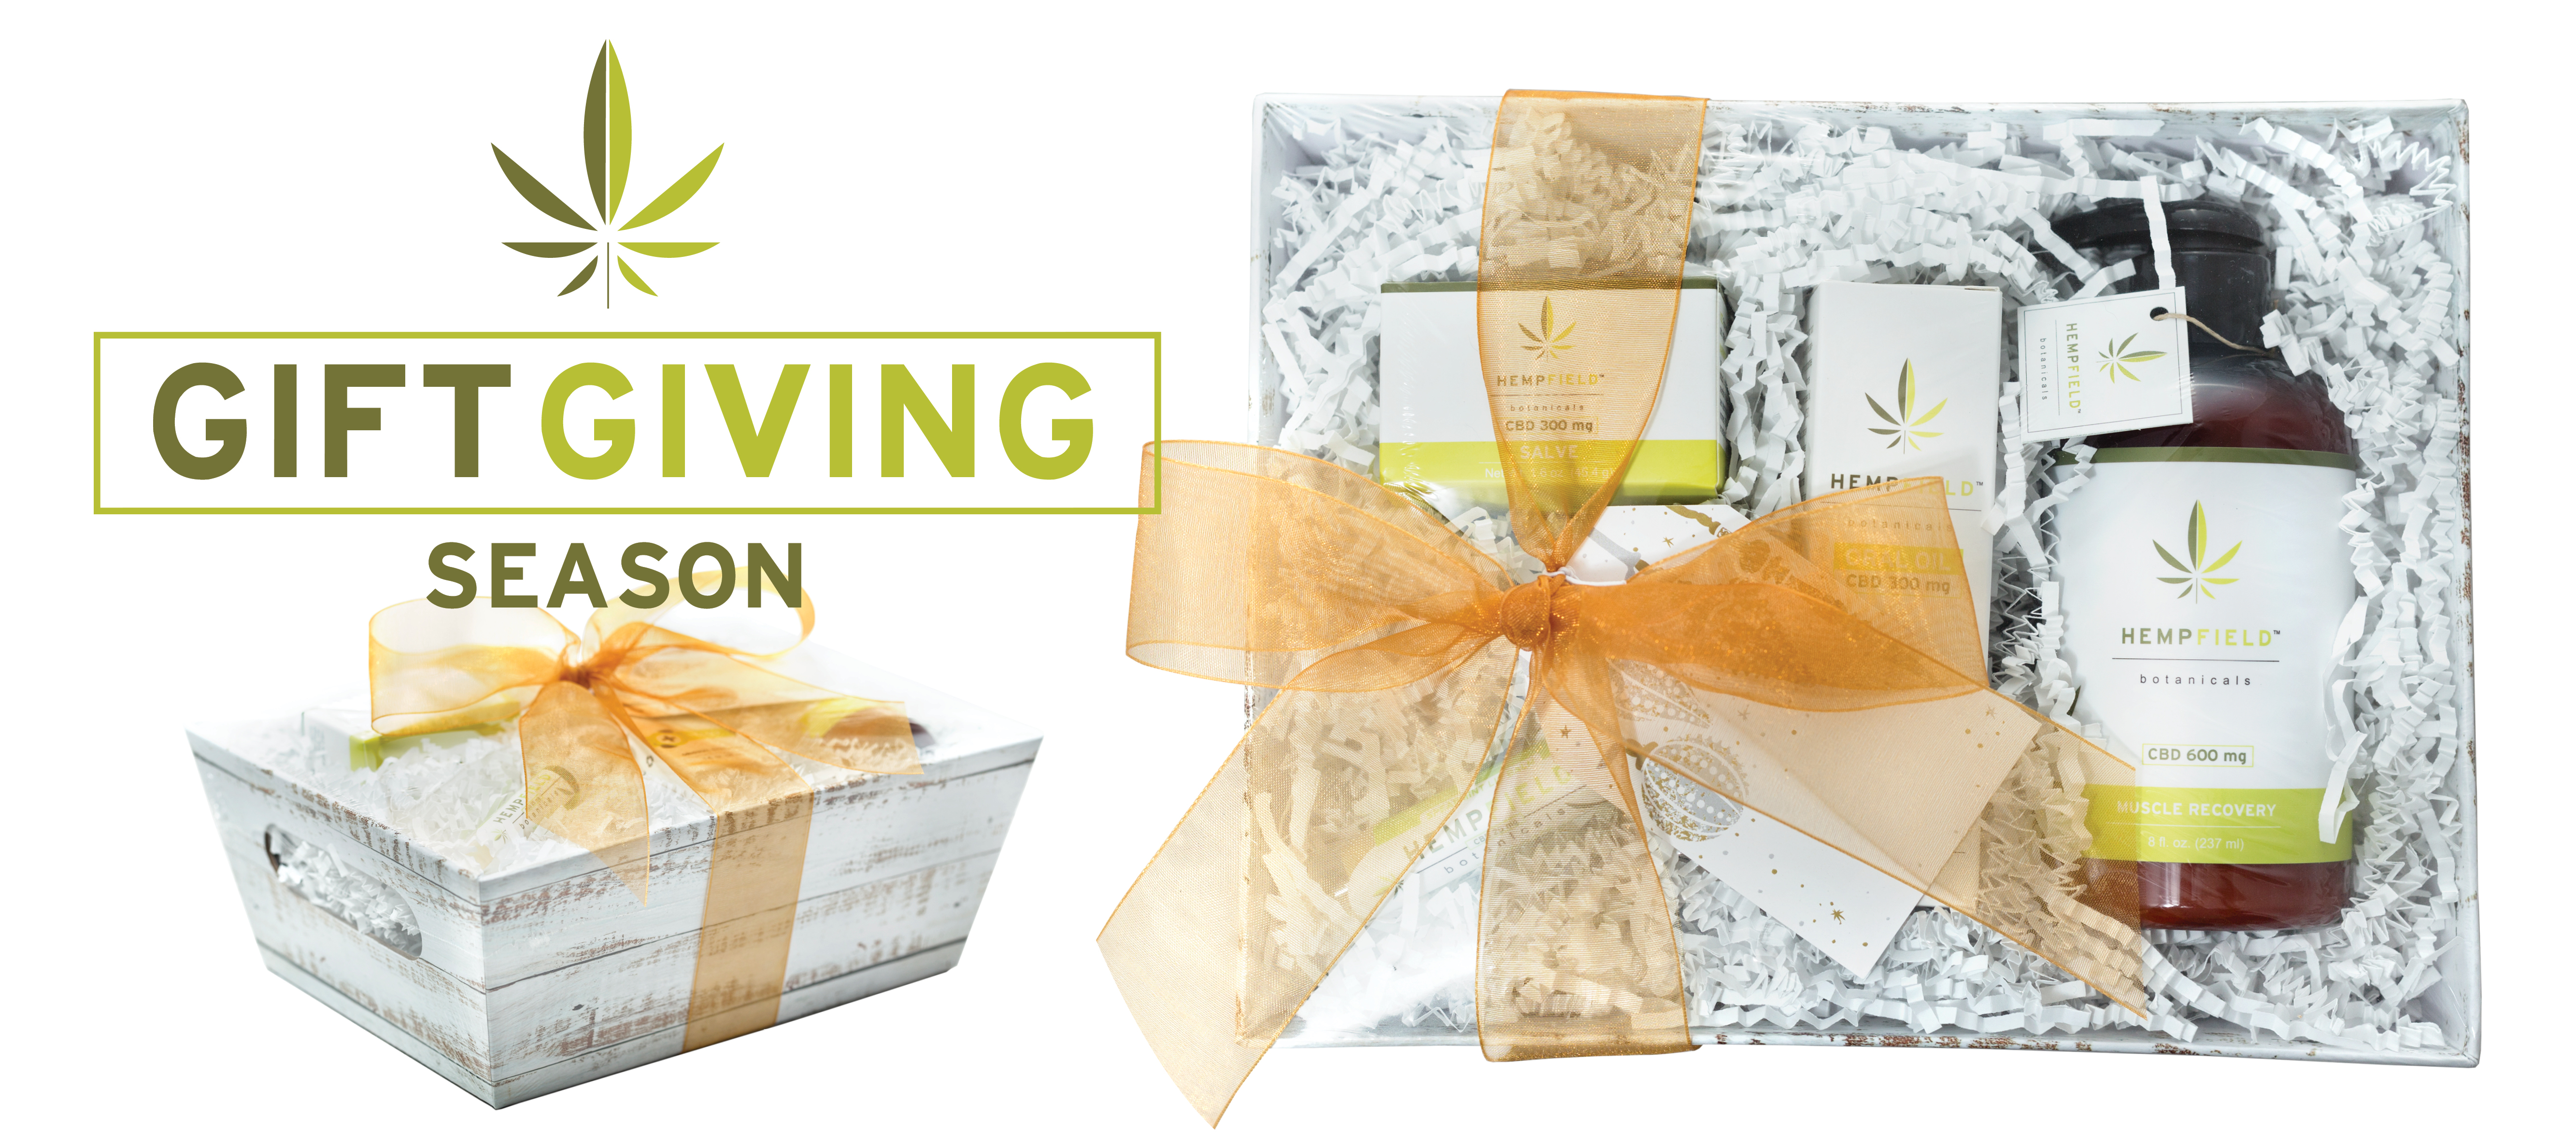 Hemp for the Holidays Gift Basket 15% OFF | Hempfield Botanicals